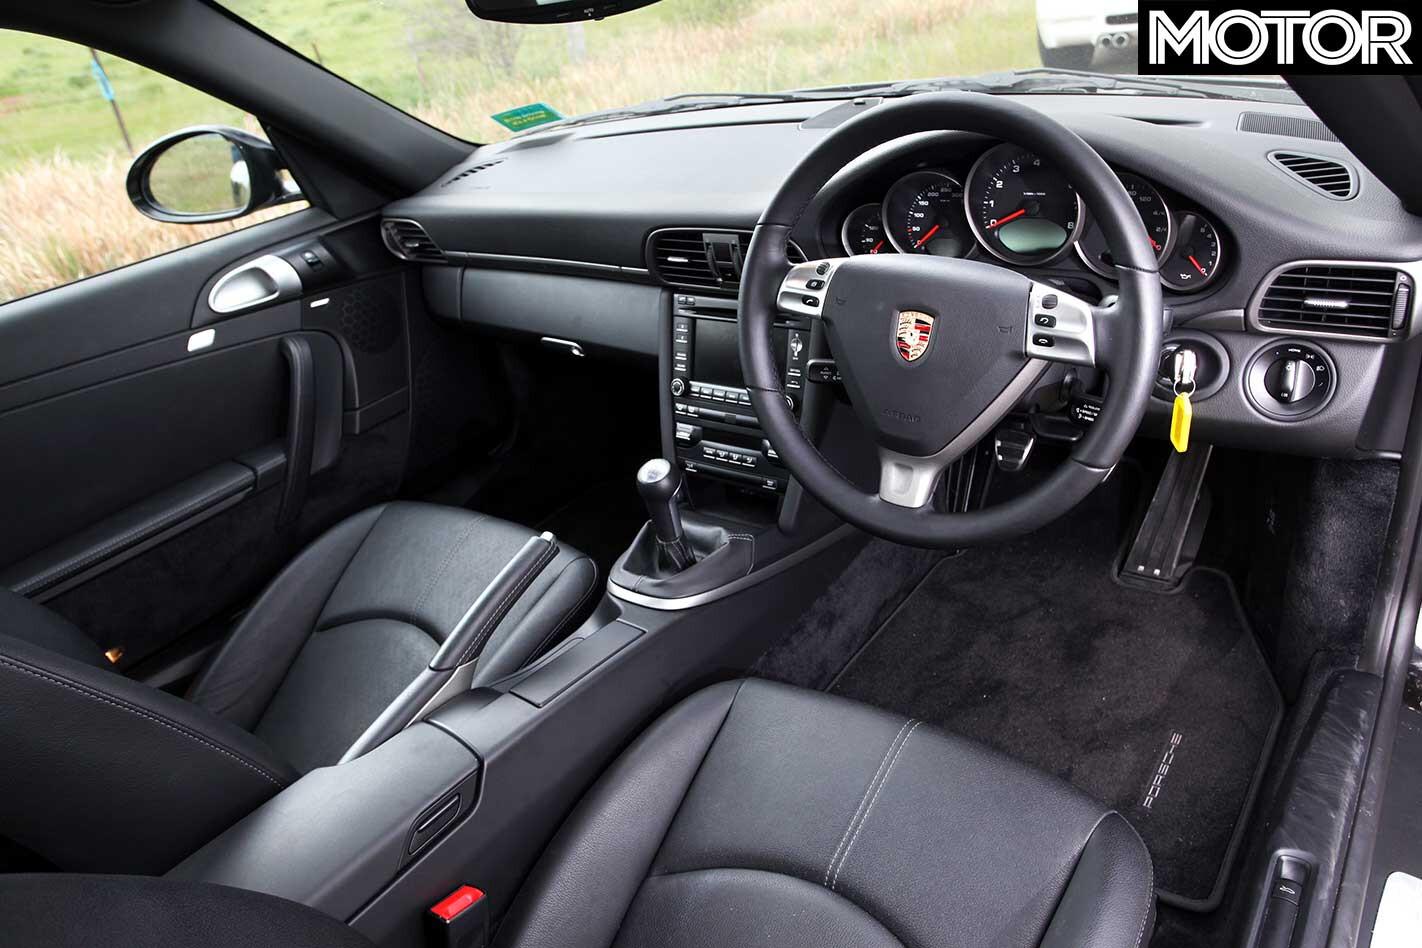 2011 Porsche 911 Carrera 4 S Interior Jpg